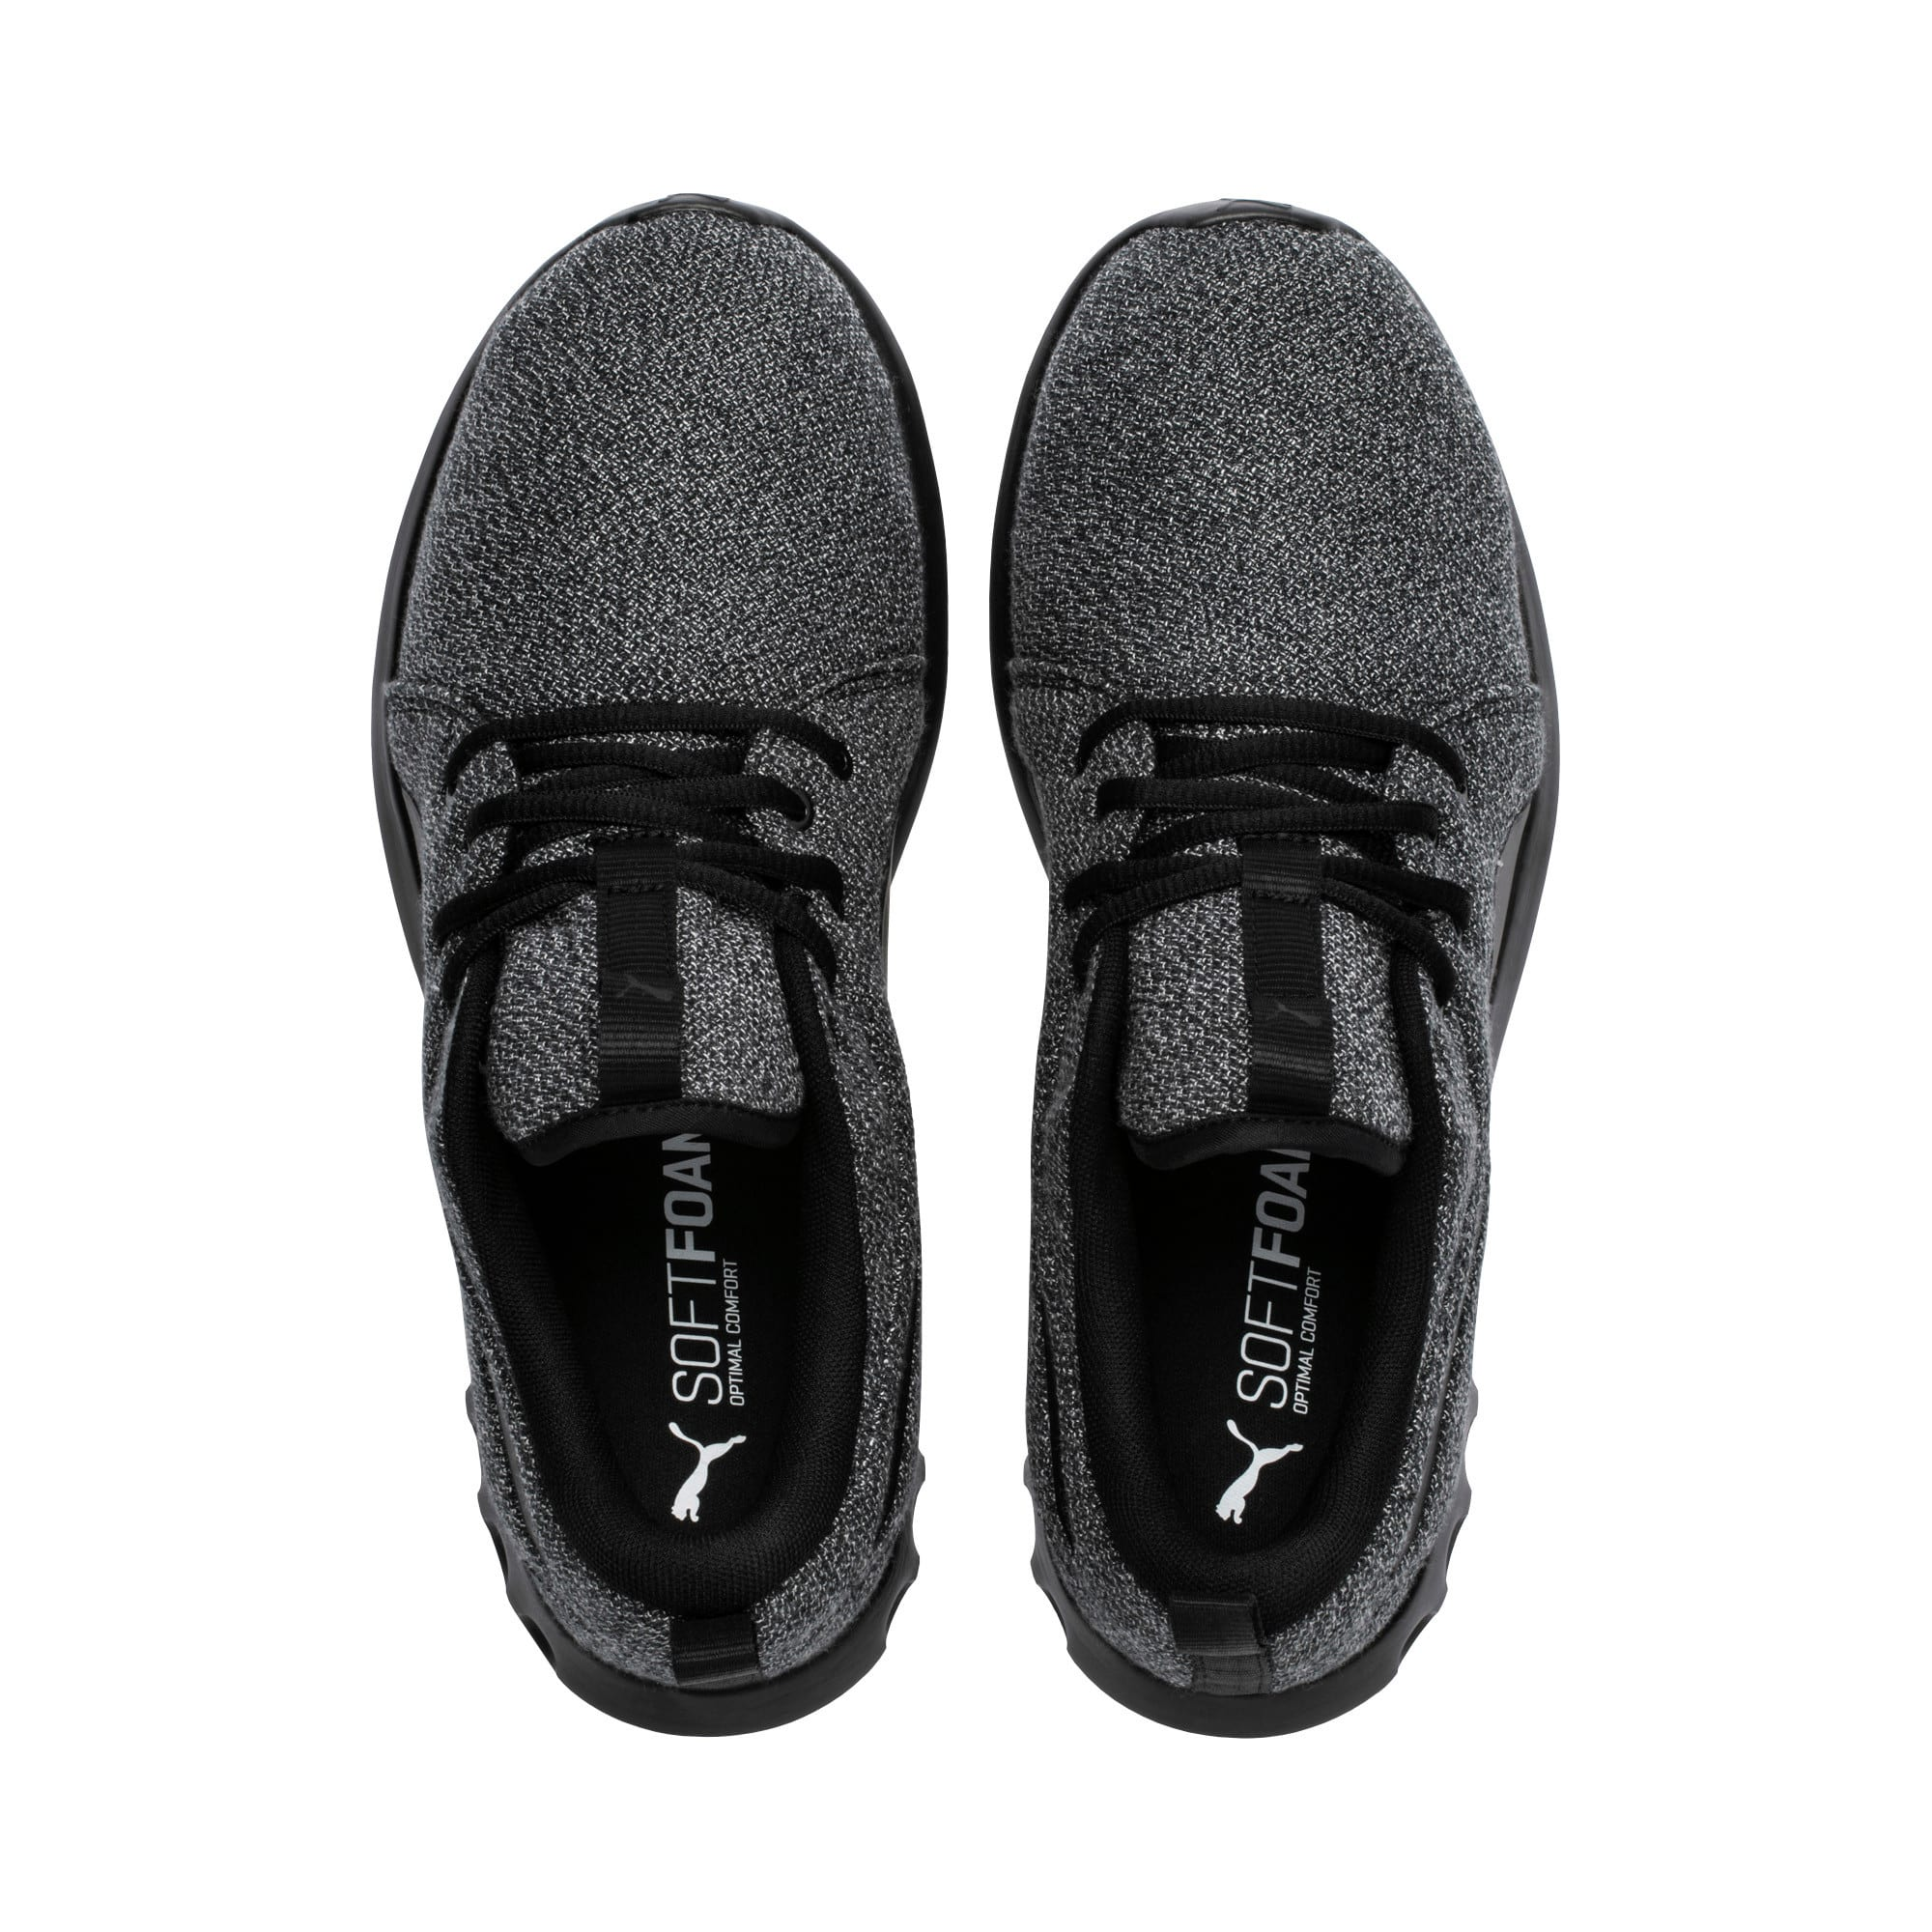 Thumbnail 6 of Carson 2 Knit Men's Training Shoes, Puma Black-Puma Black, medium